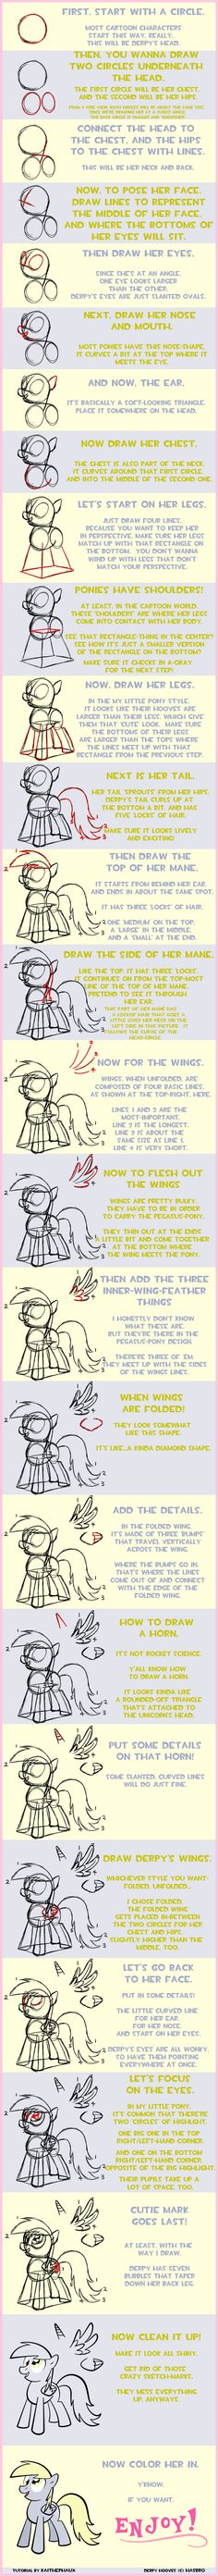 How to draw Derpy by KaiThePhaux.deviantart.com on @deviantART